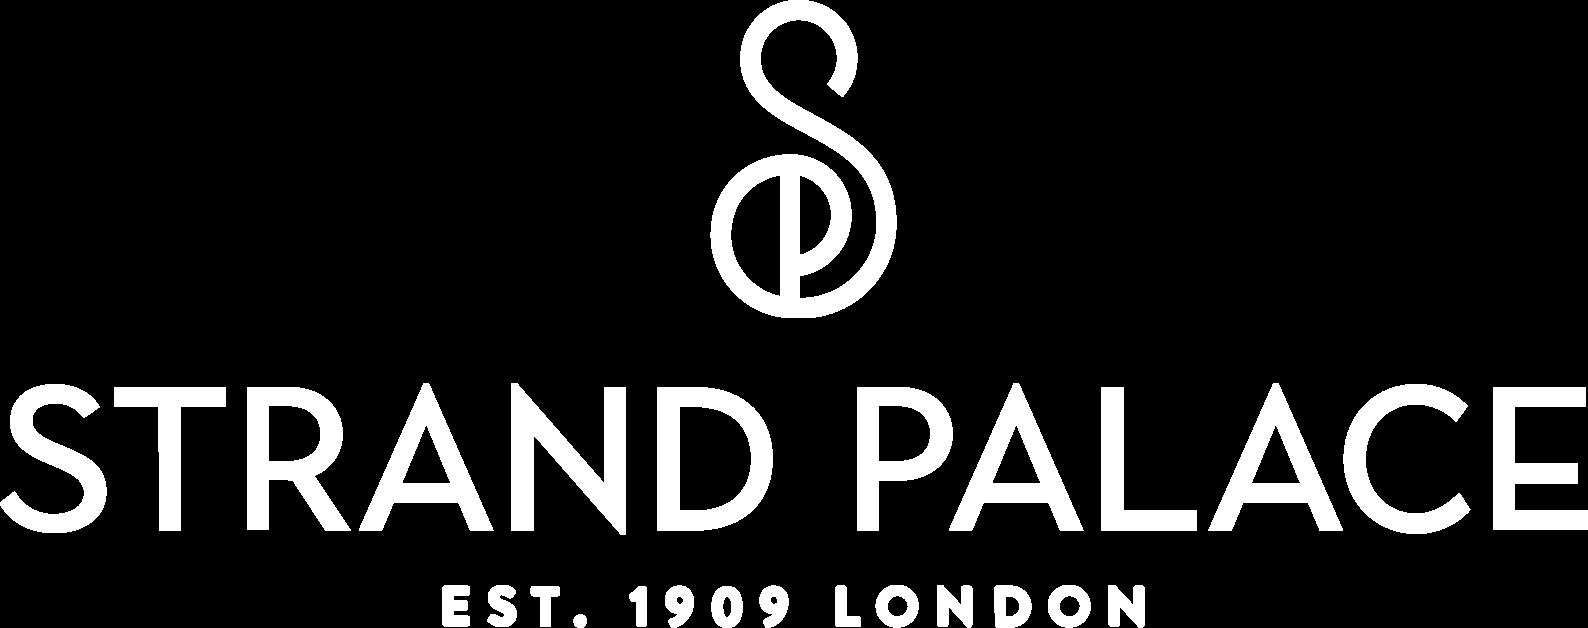 https://d337pdvlg6sju5.cloudfront.net/media/logo/logo-light.png